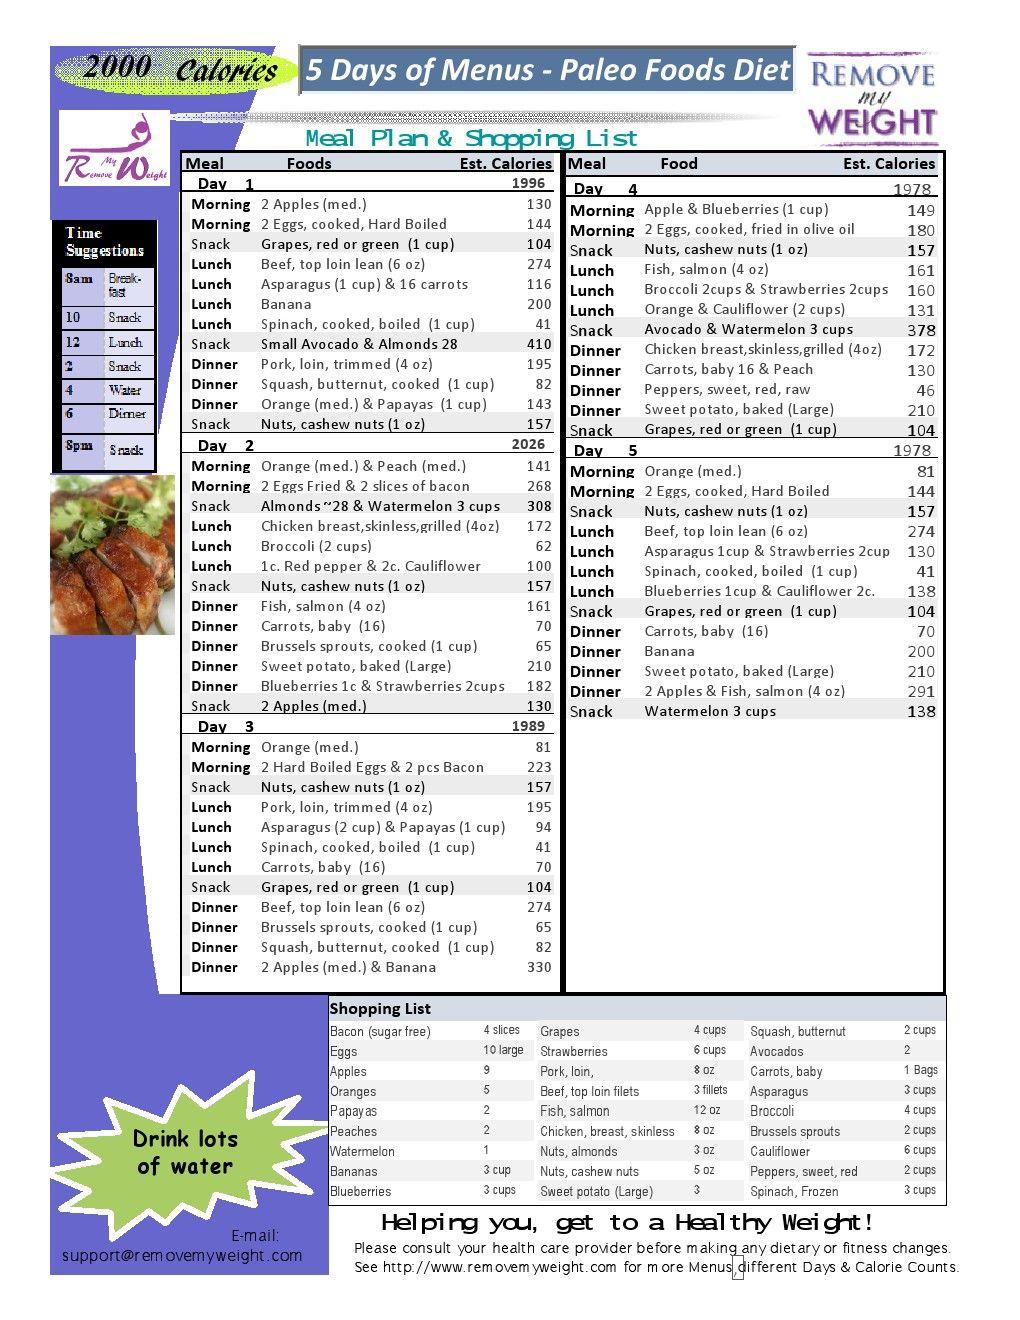 Gtf chromium weight loss reviews